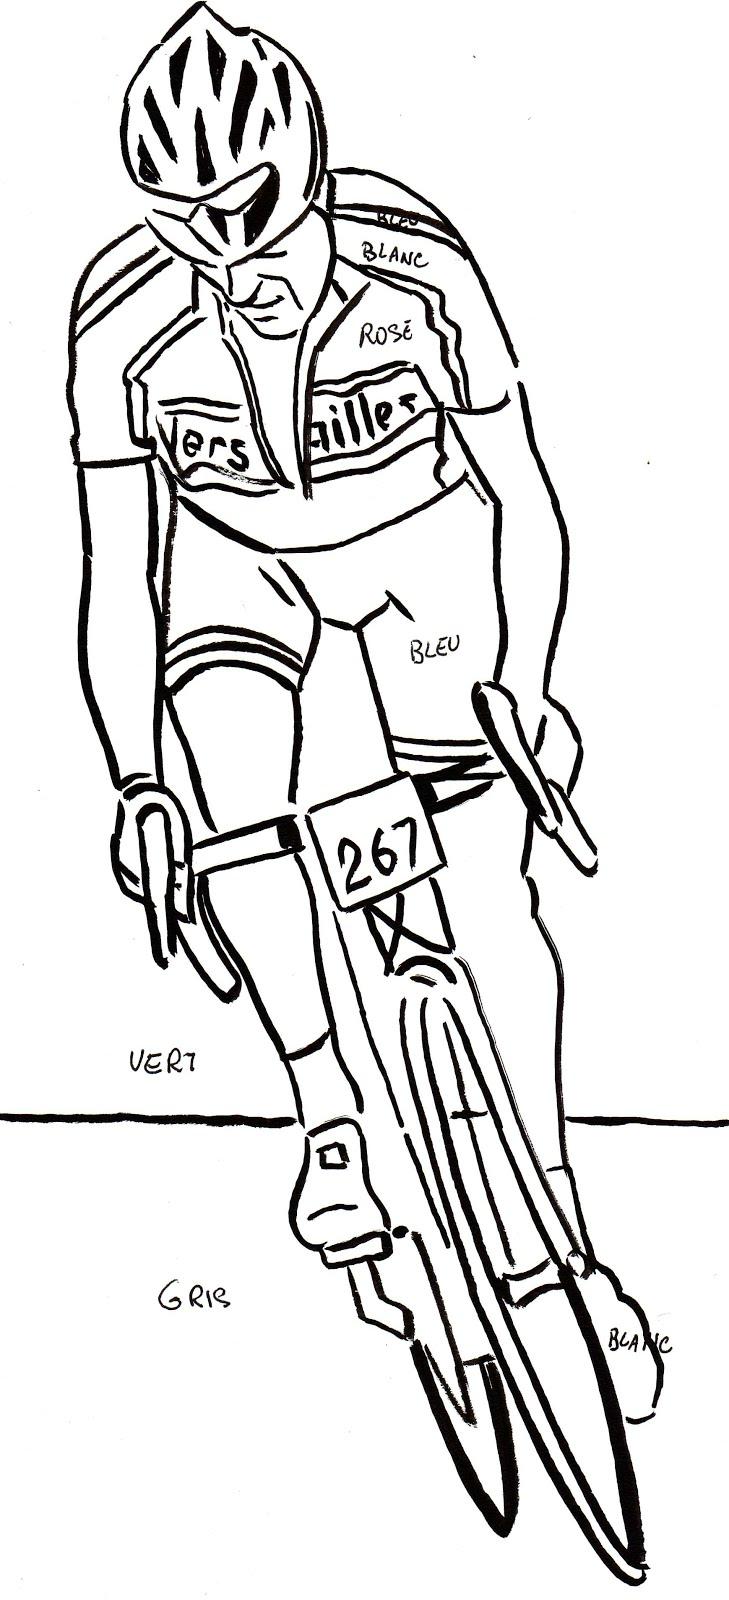 95 dessins de coloriage velo a imprimer imprimer - Coloriage de cycliste ...